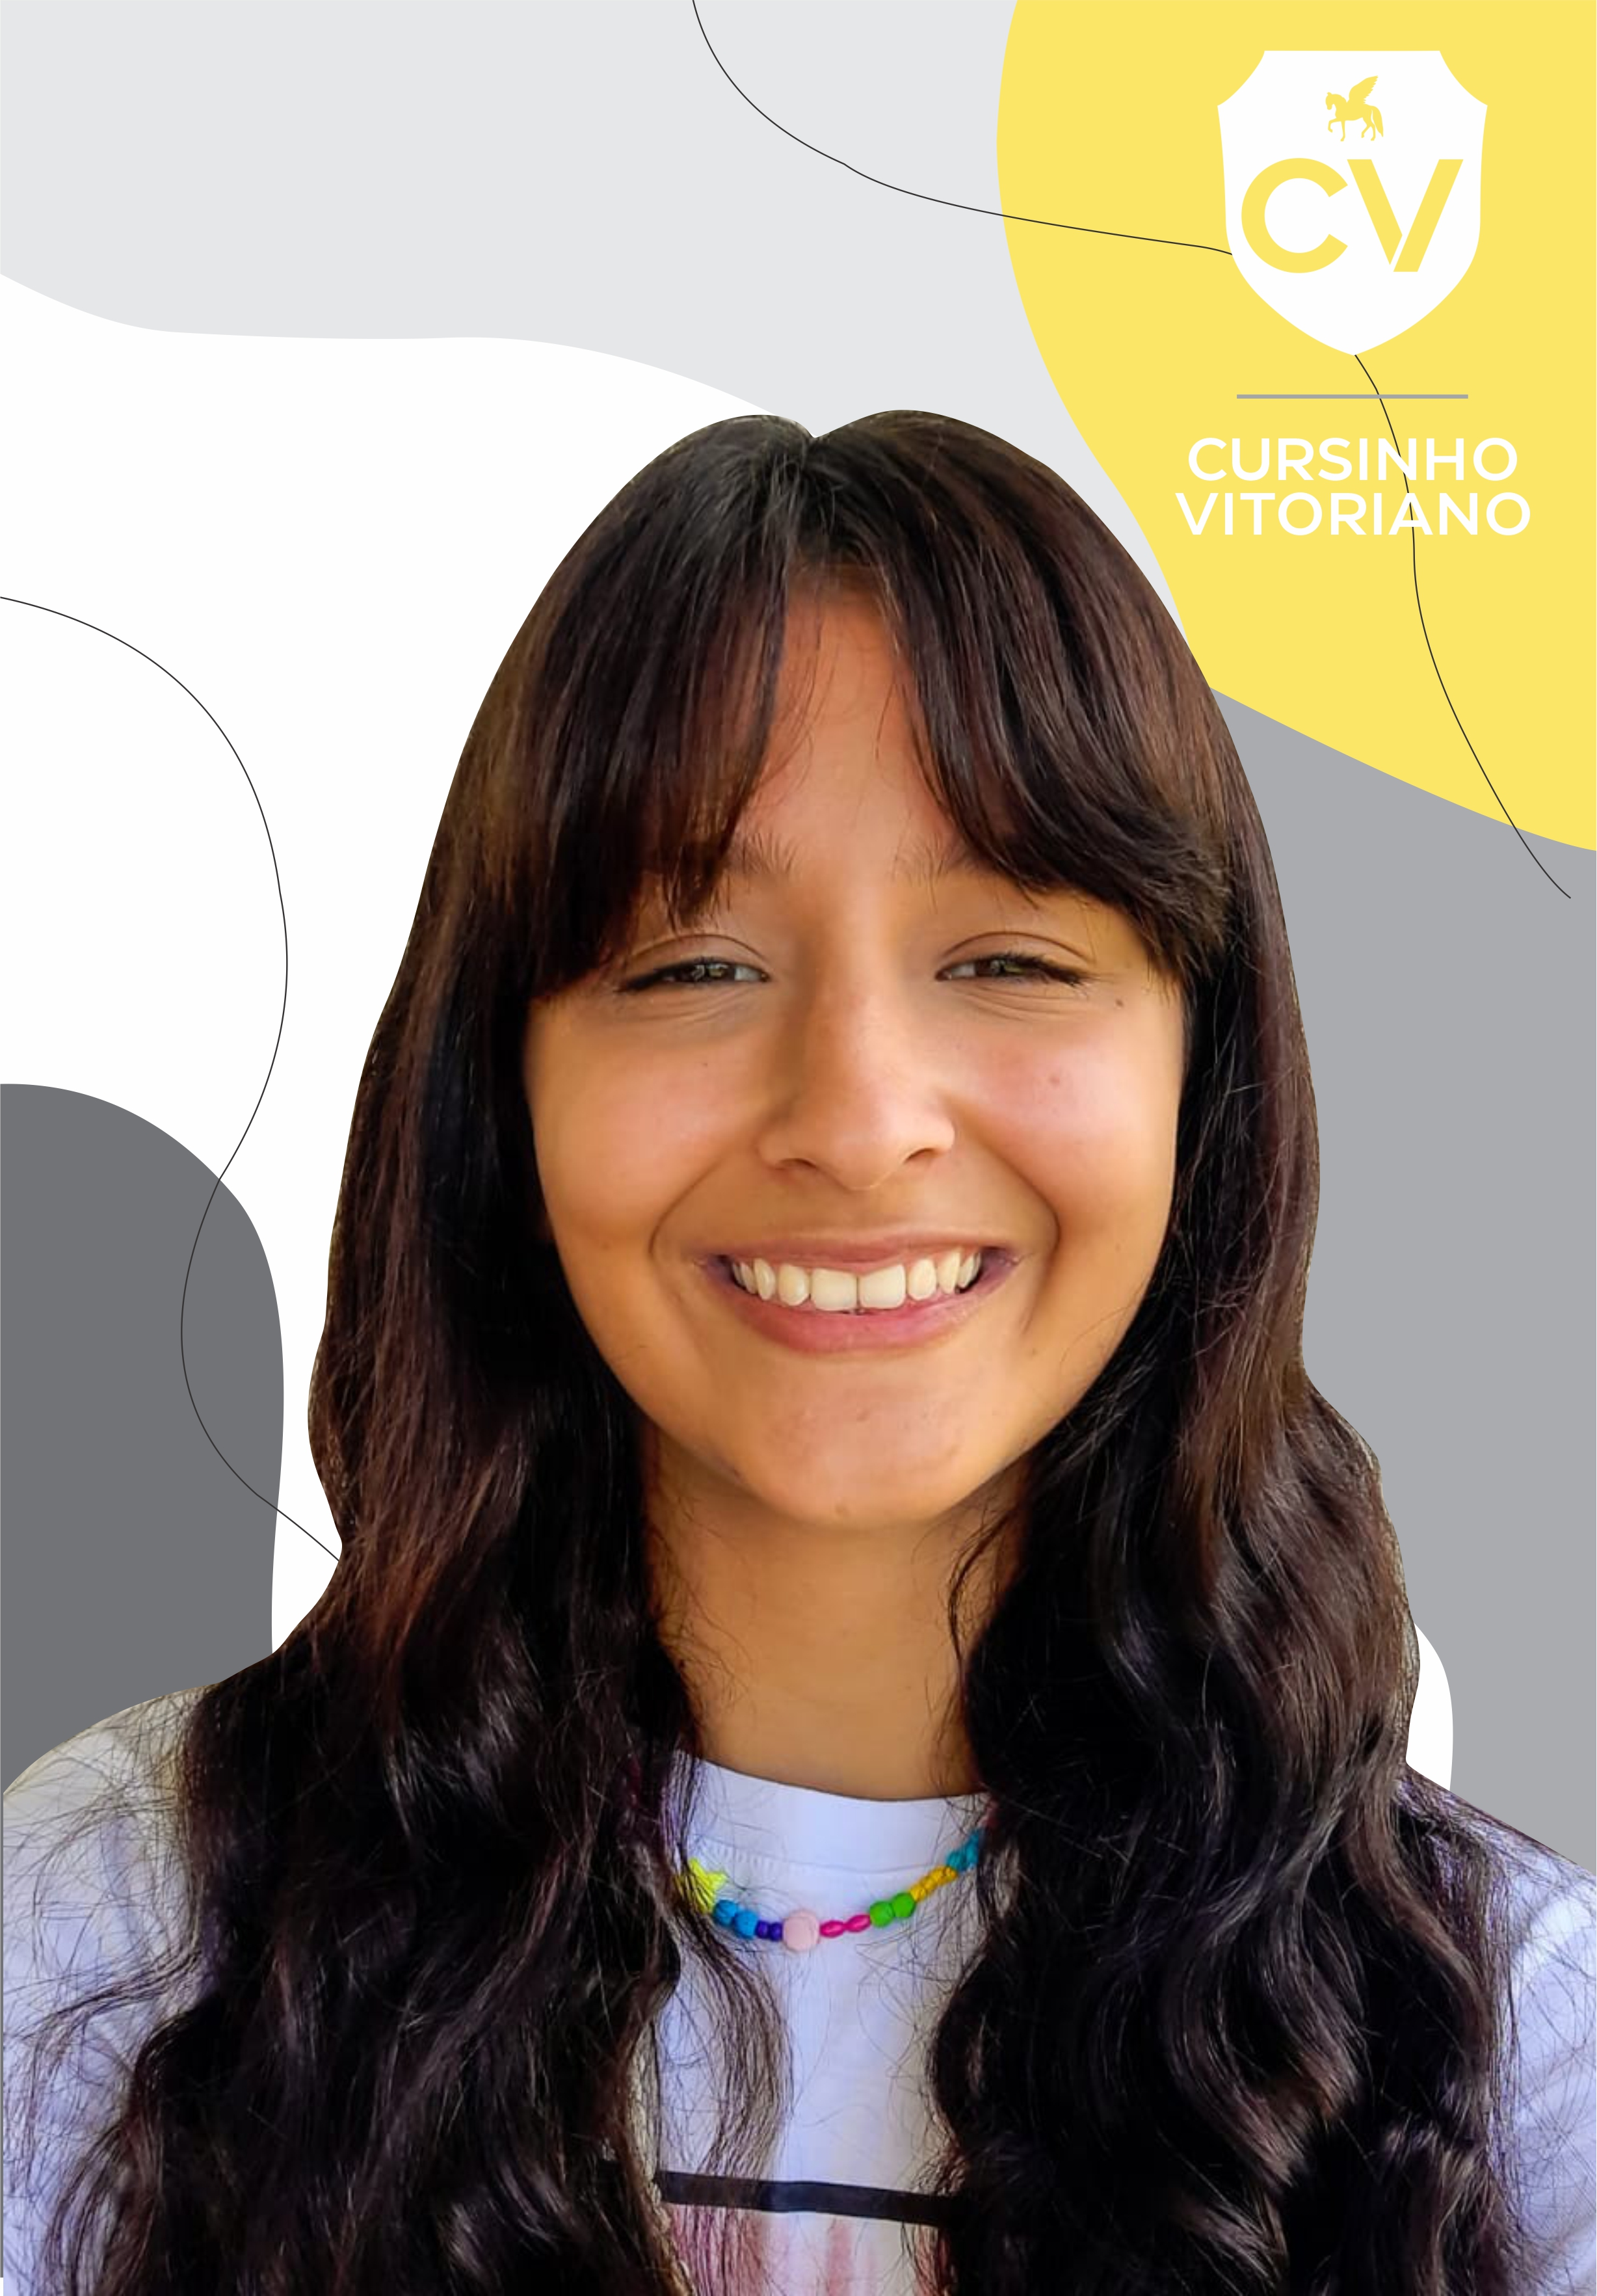 Marina Vasques Felício